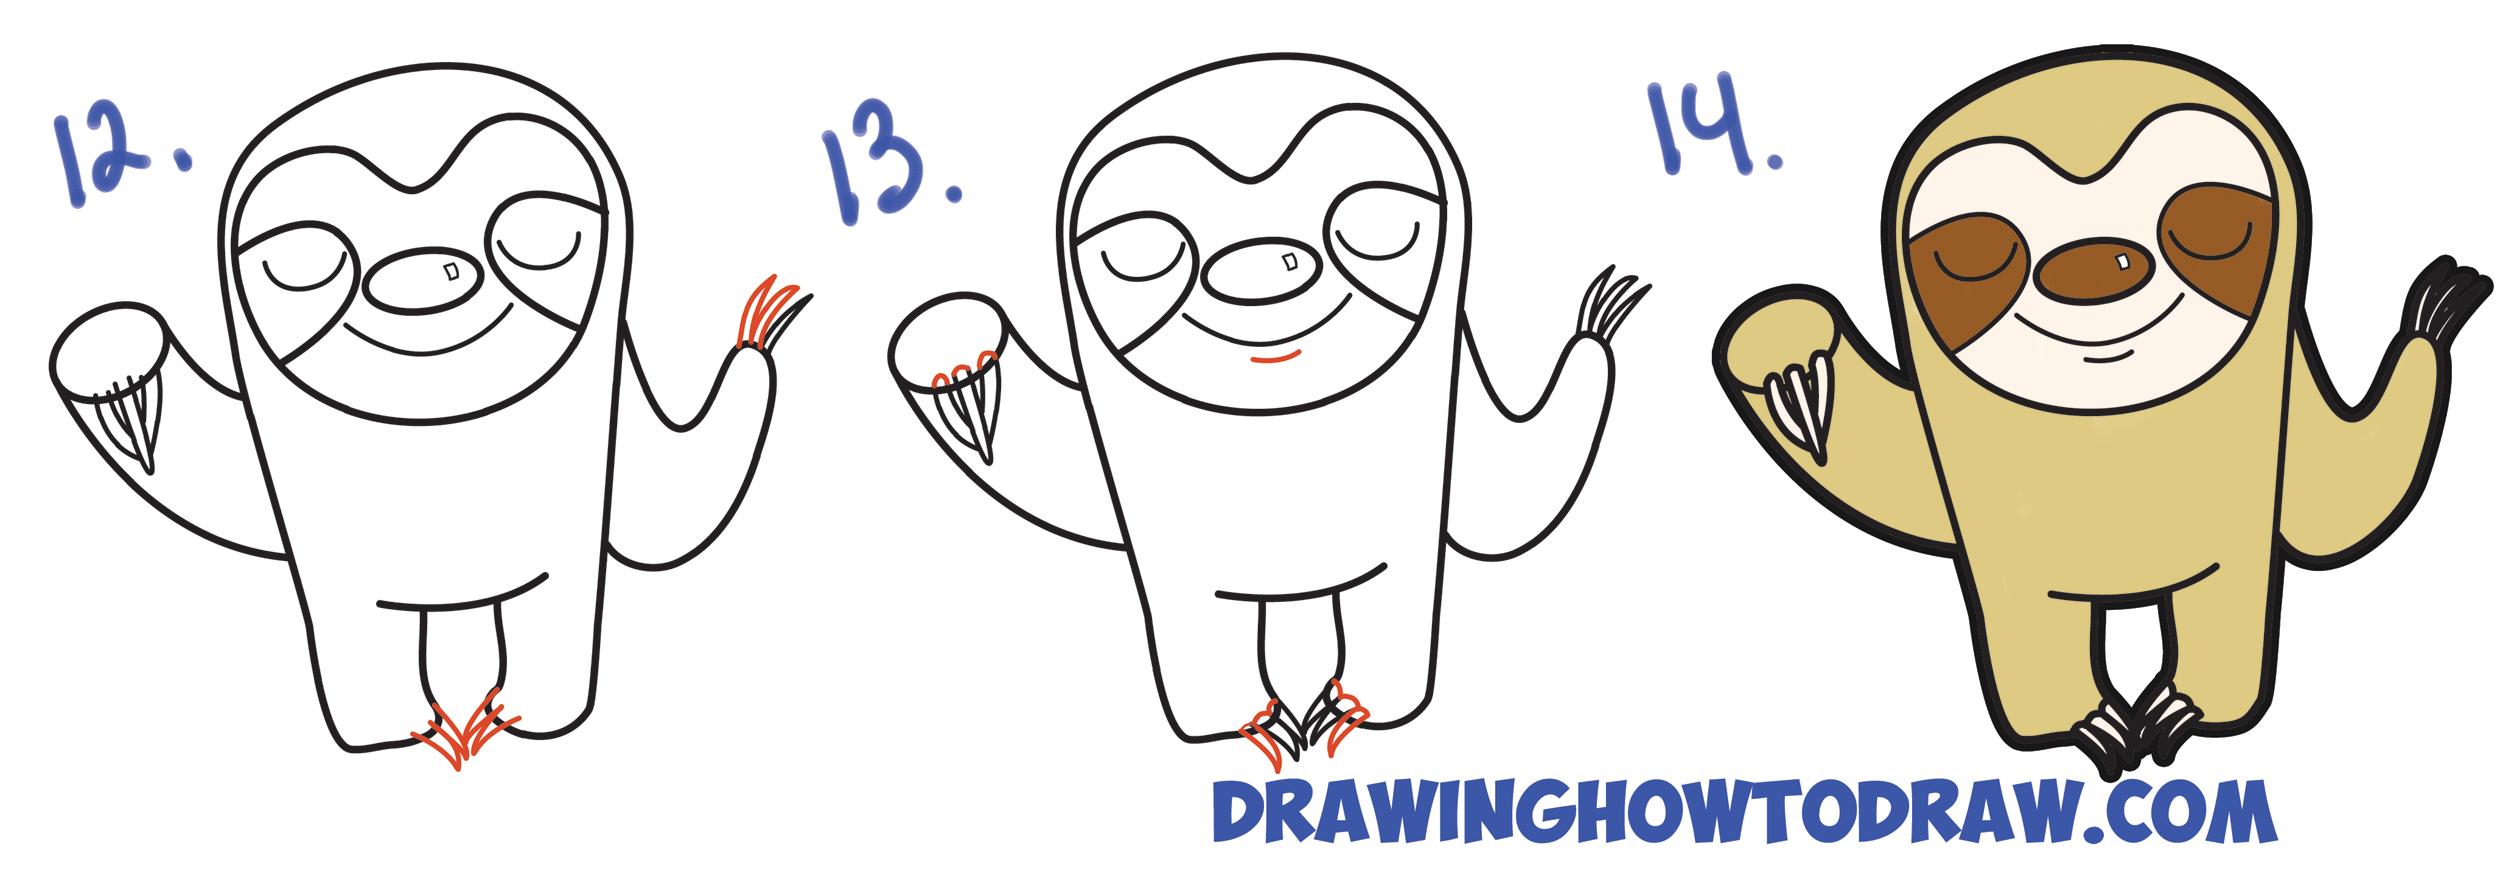 Sloth cartoons for Cartoon drawing tutorials for beginners